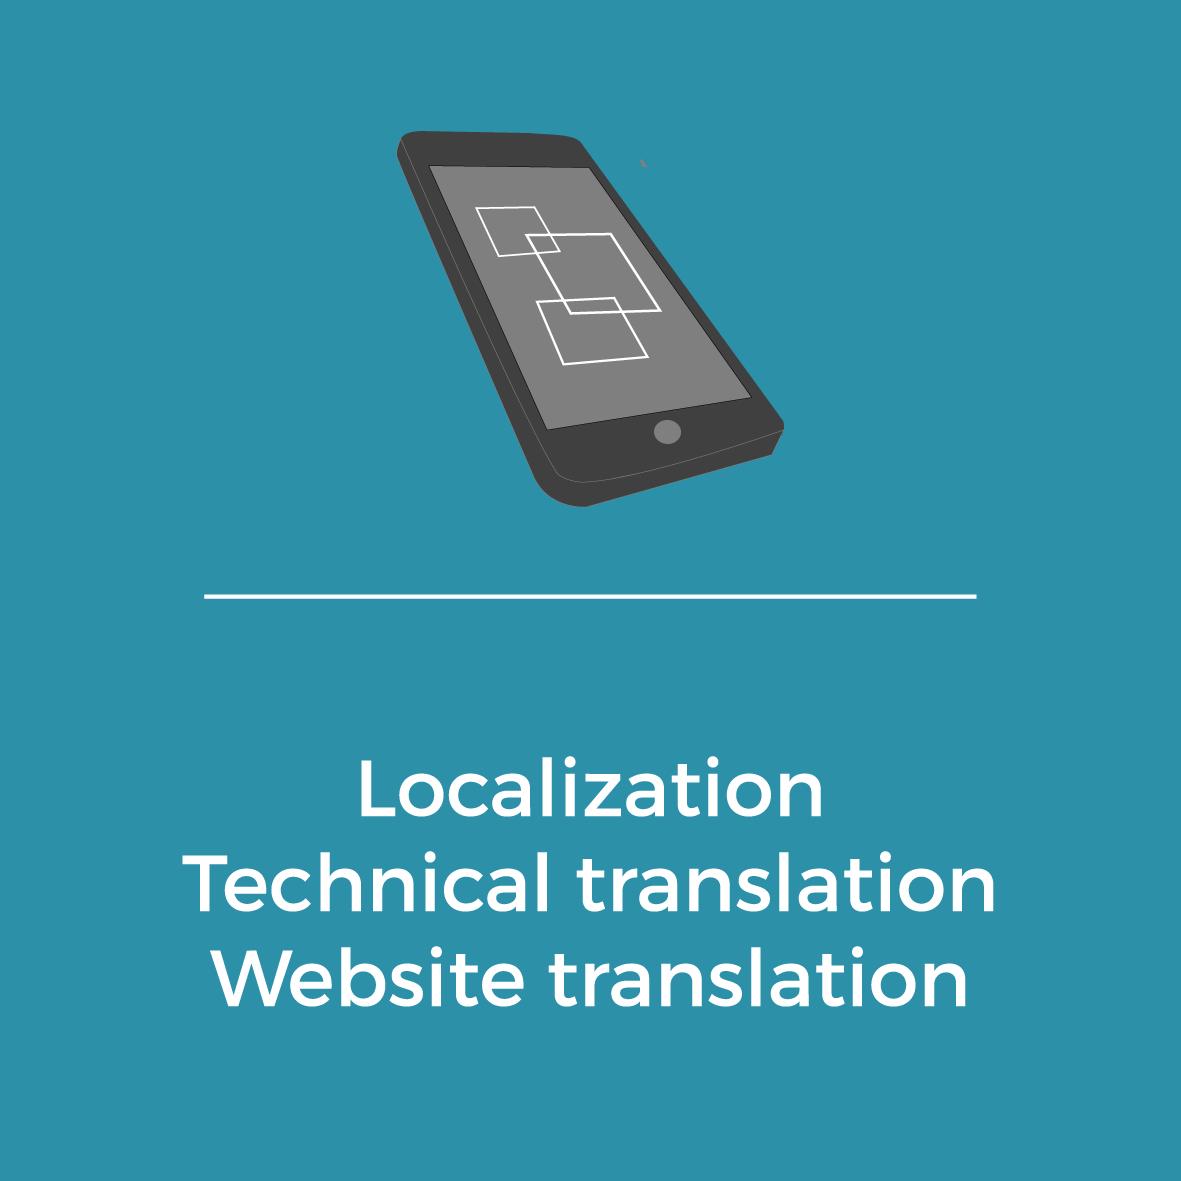 Services - Localization - Technical translation - Website translation